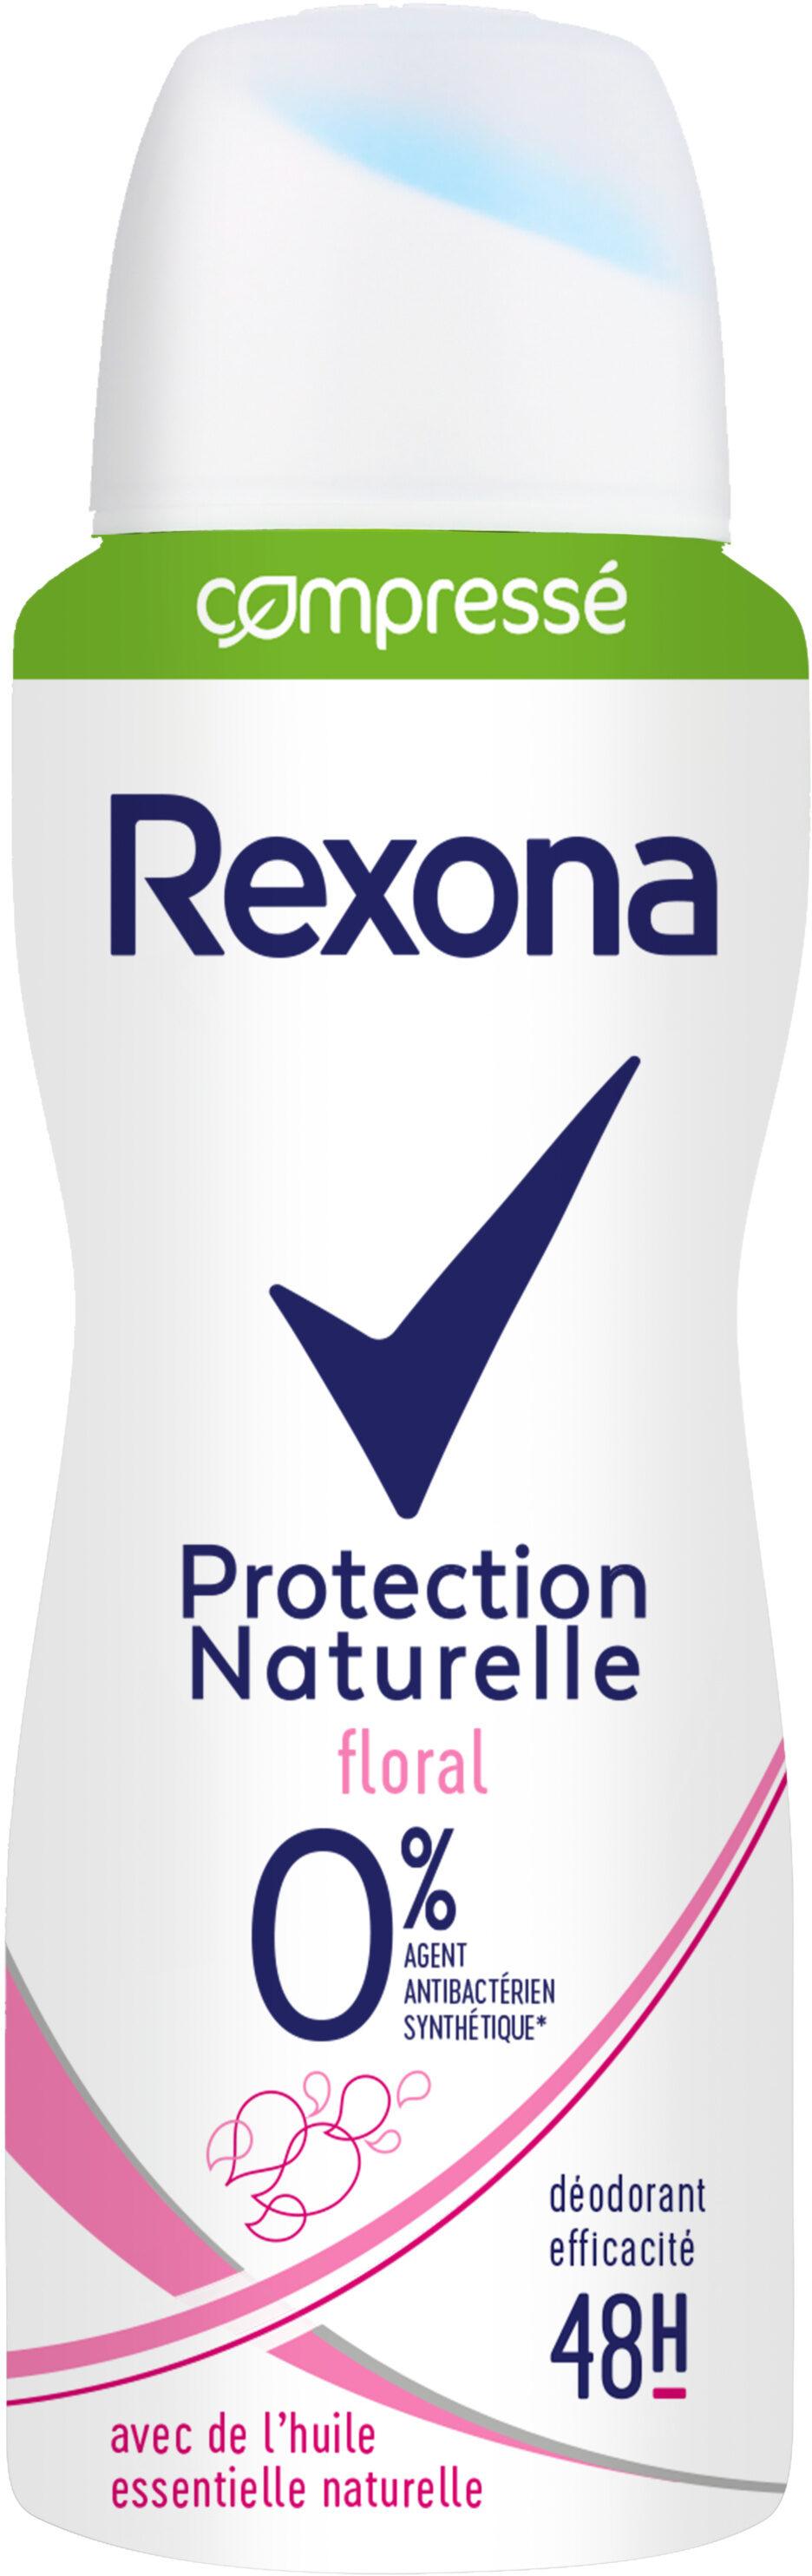 REXONA Déodorant Femme Spray Antibactérien Protection Naturelle Floral 48H - Product - fr